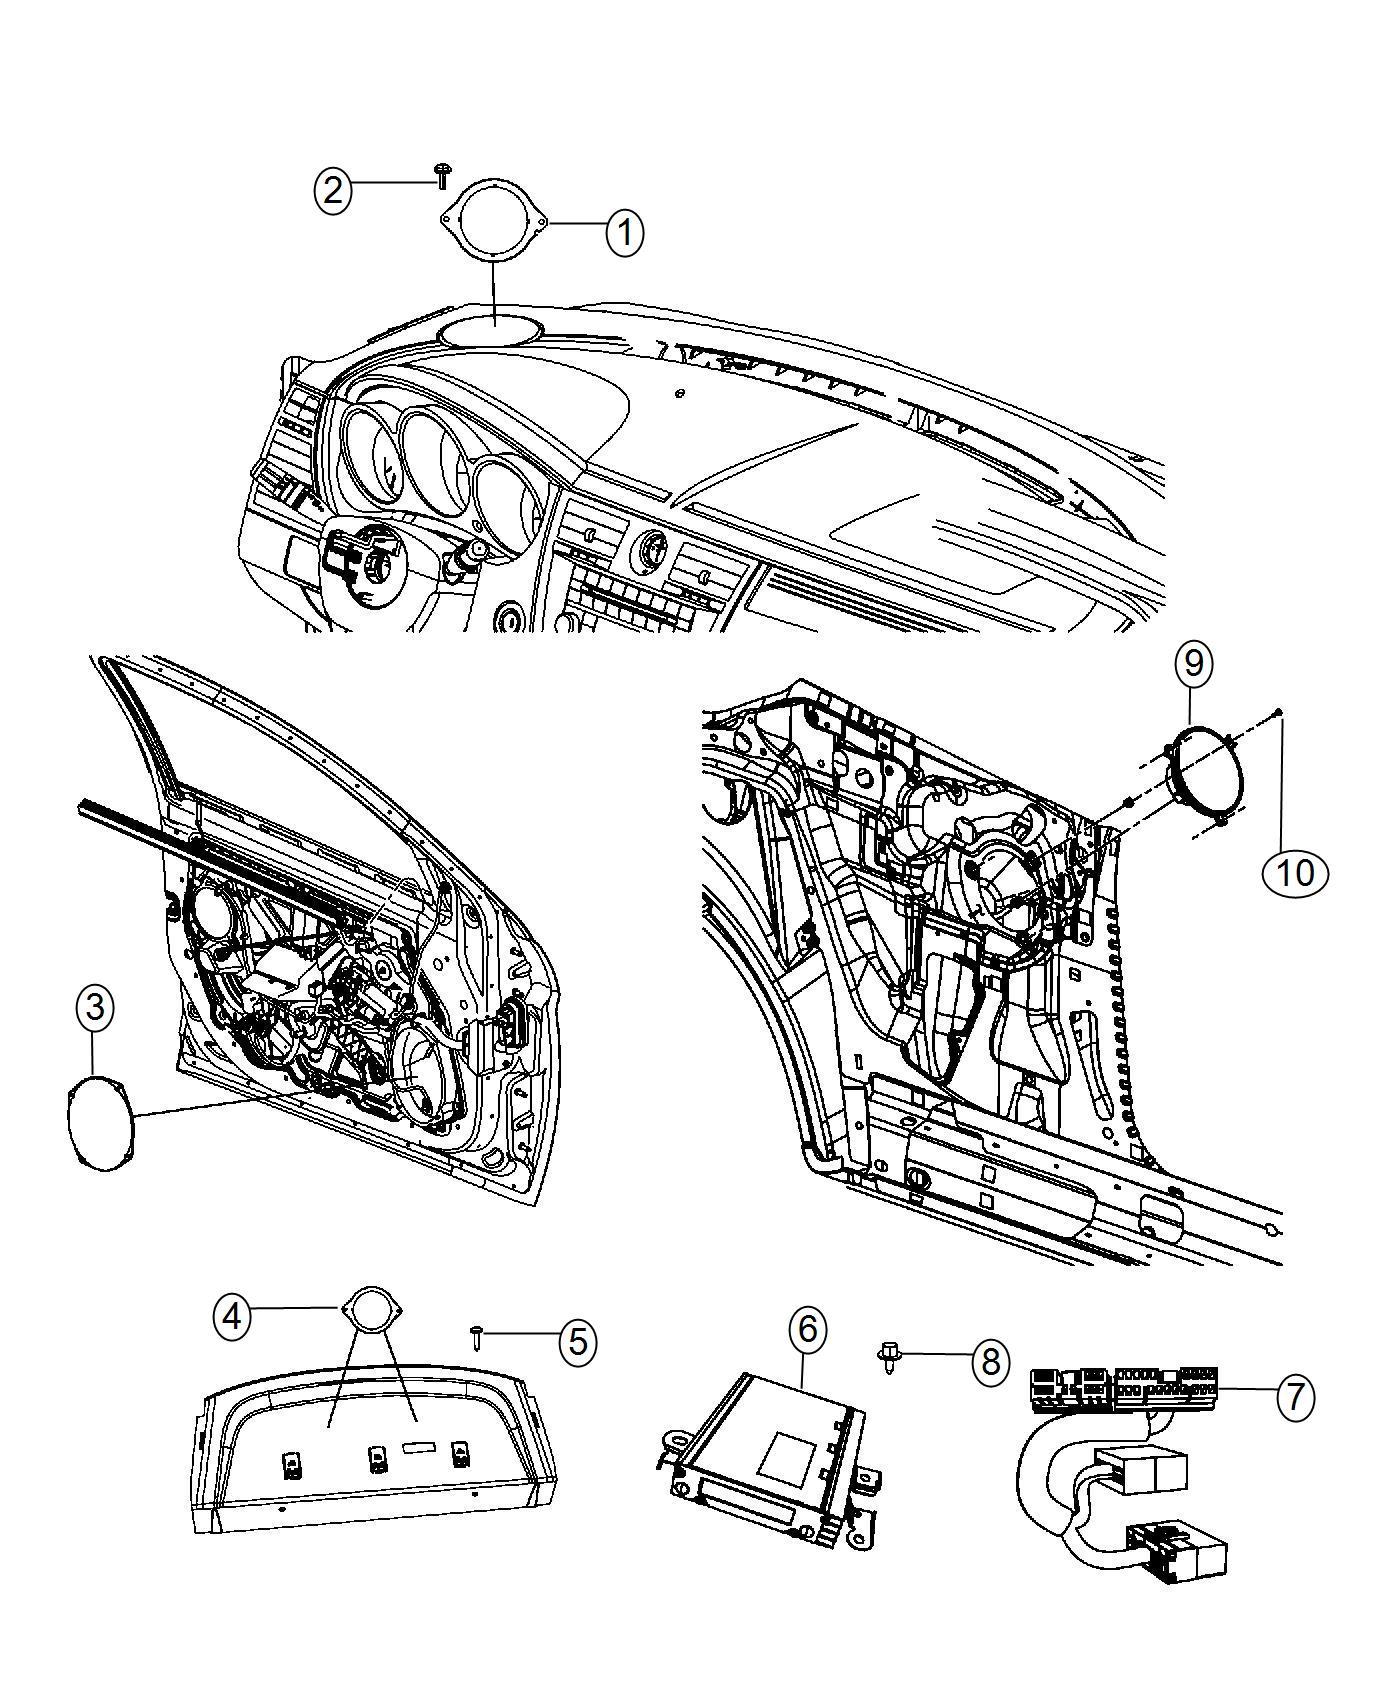 Chrysler 200 Amplifier 276w Boston Acoustic Speakers 6 With Bracket